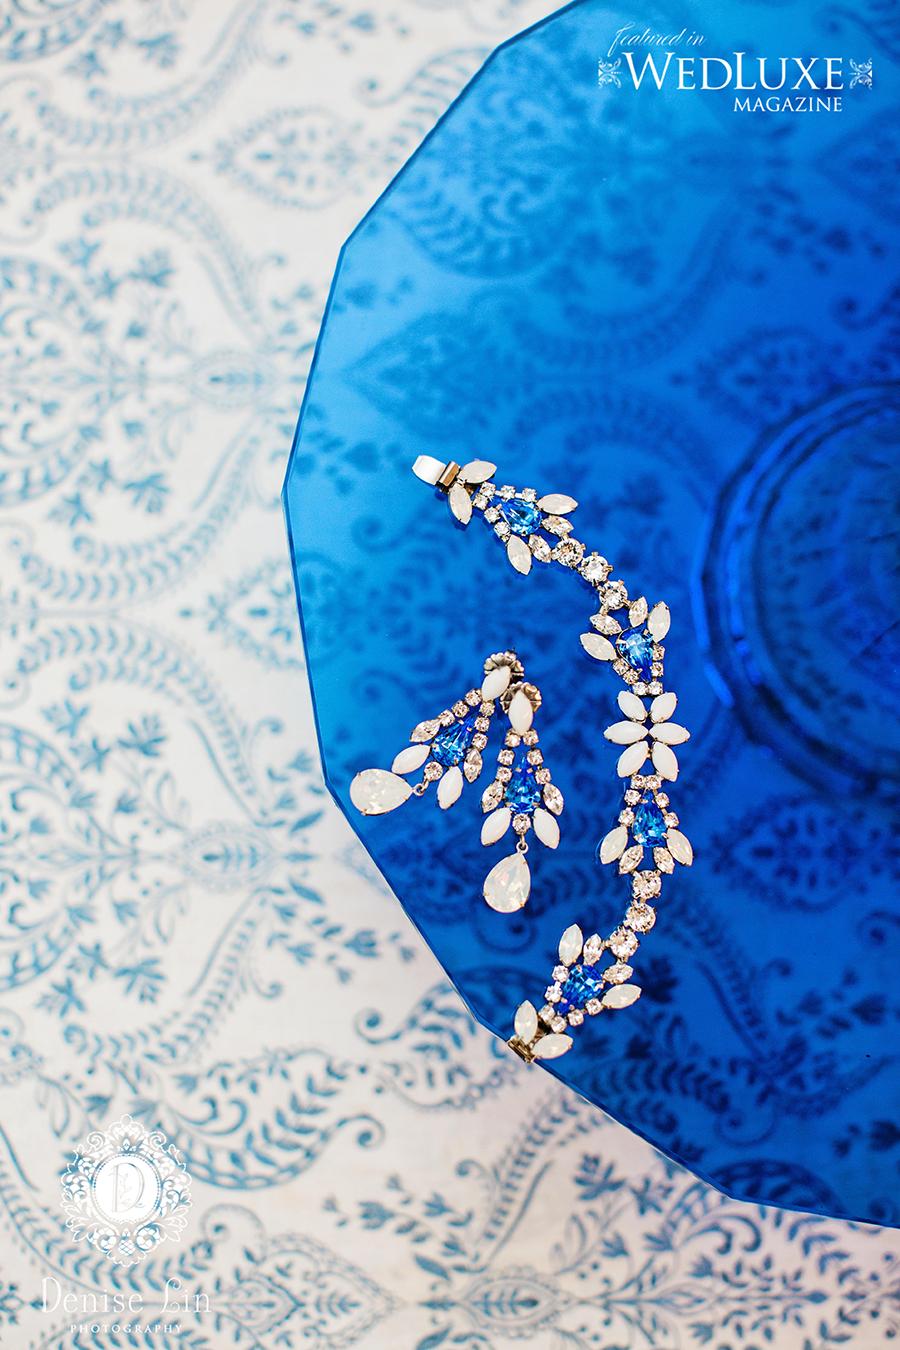 Wedluxe Magazine, Galia Lahav Vancouver Toronto Wedding Jewelry Elsa Corsi www.elsacorsi.com